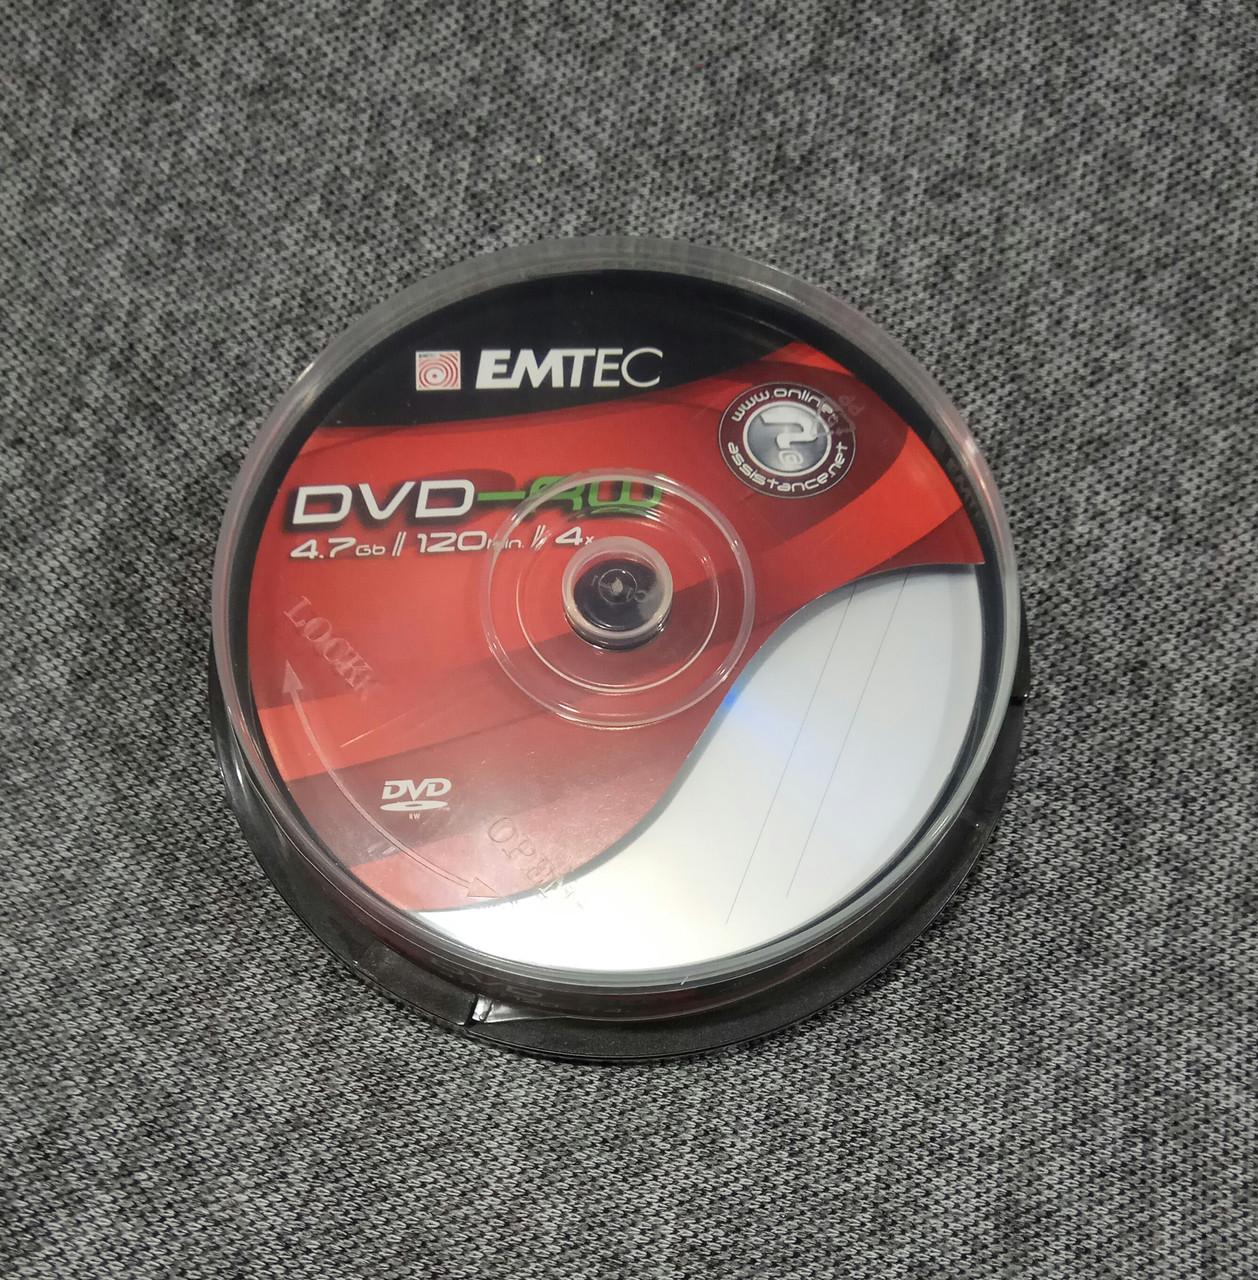 Диски DVD-RW EMTEC